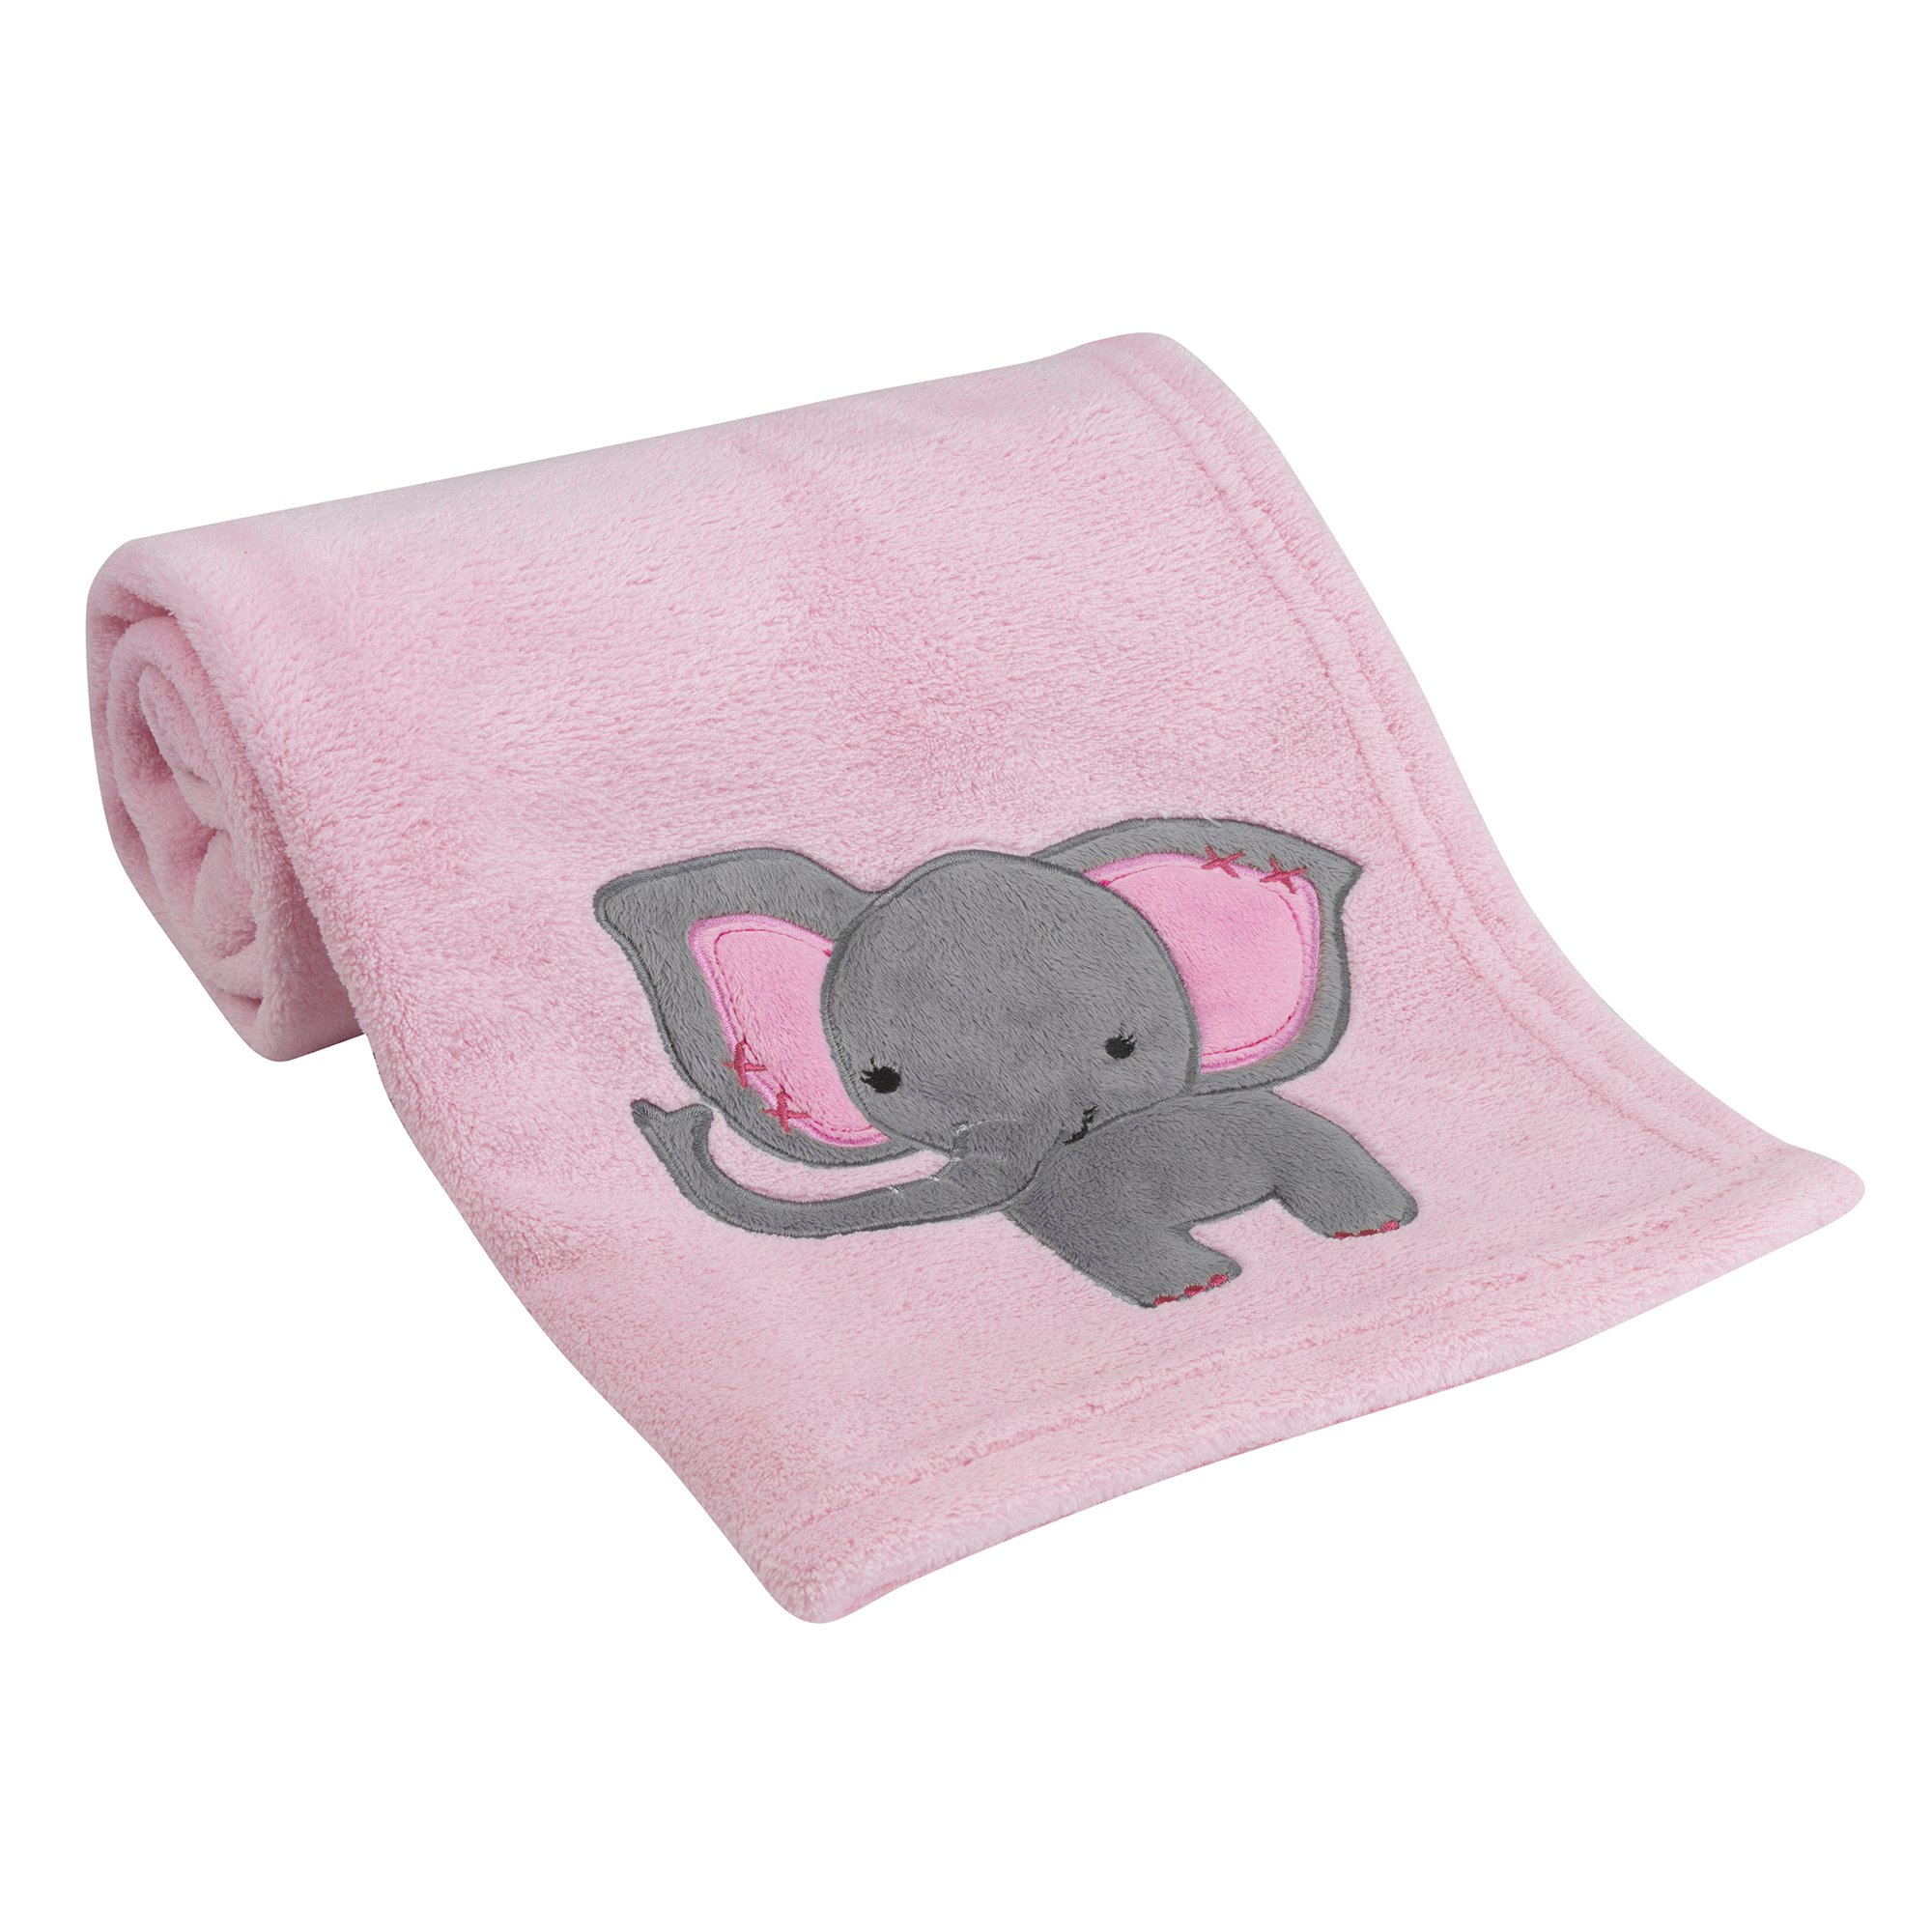 Bedtime Originals Twinkle Toes Elephant Blanket, Pink/Gray